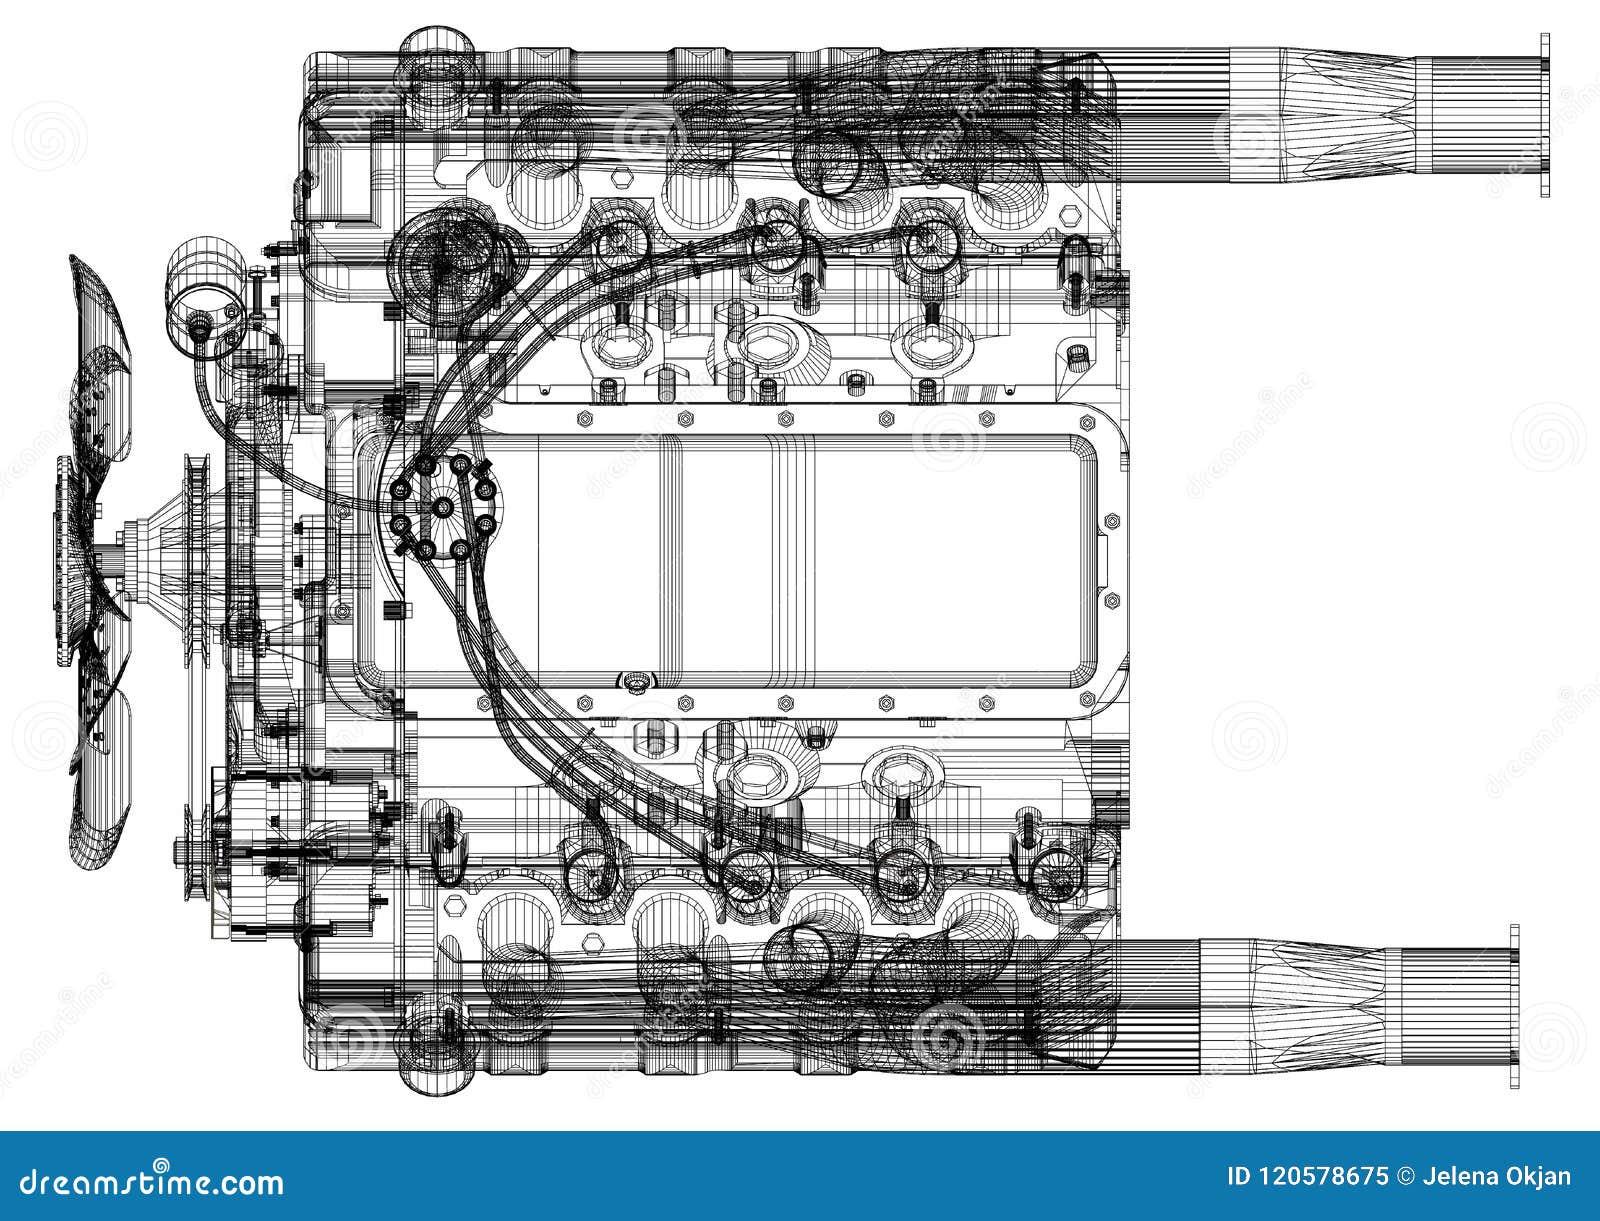 Car Engine Design Architect Blueprint Isolated Stock Illustration Illustration Of Innovation Concepts 120578675